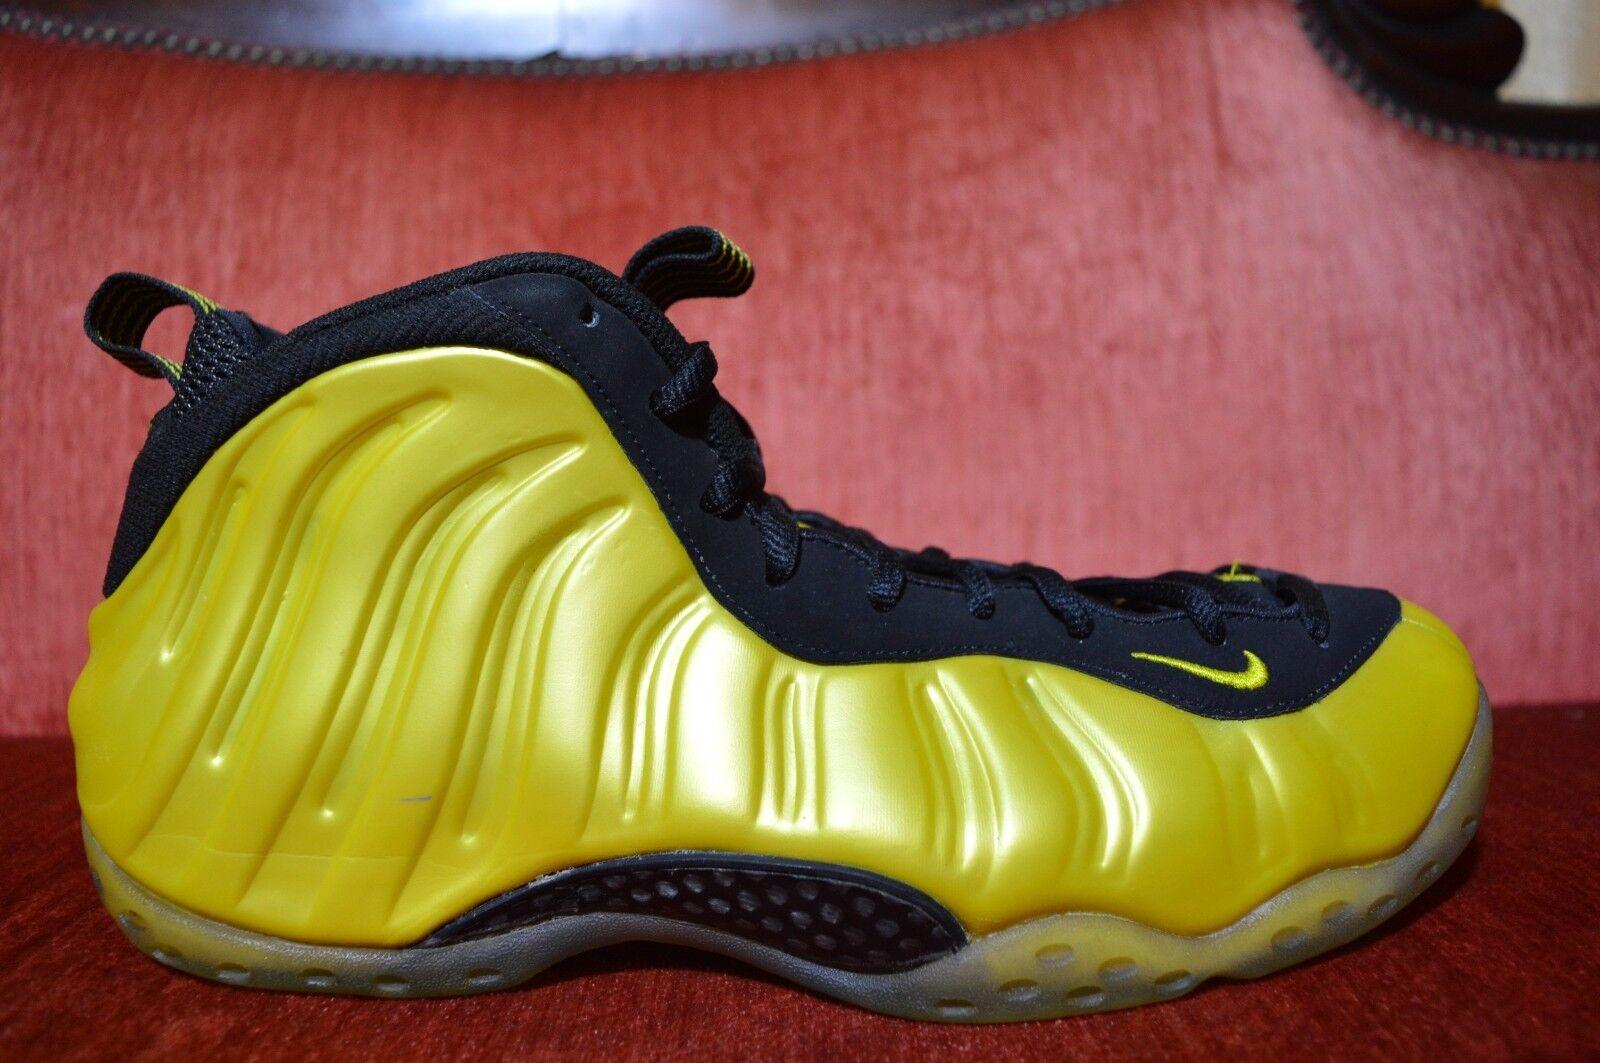 Nike air foamposite uno electrolime 314996-330 giallo verde elettrico numero 11